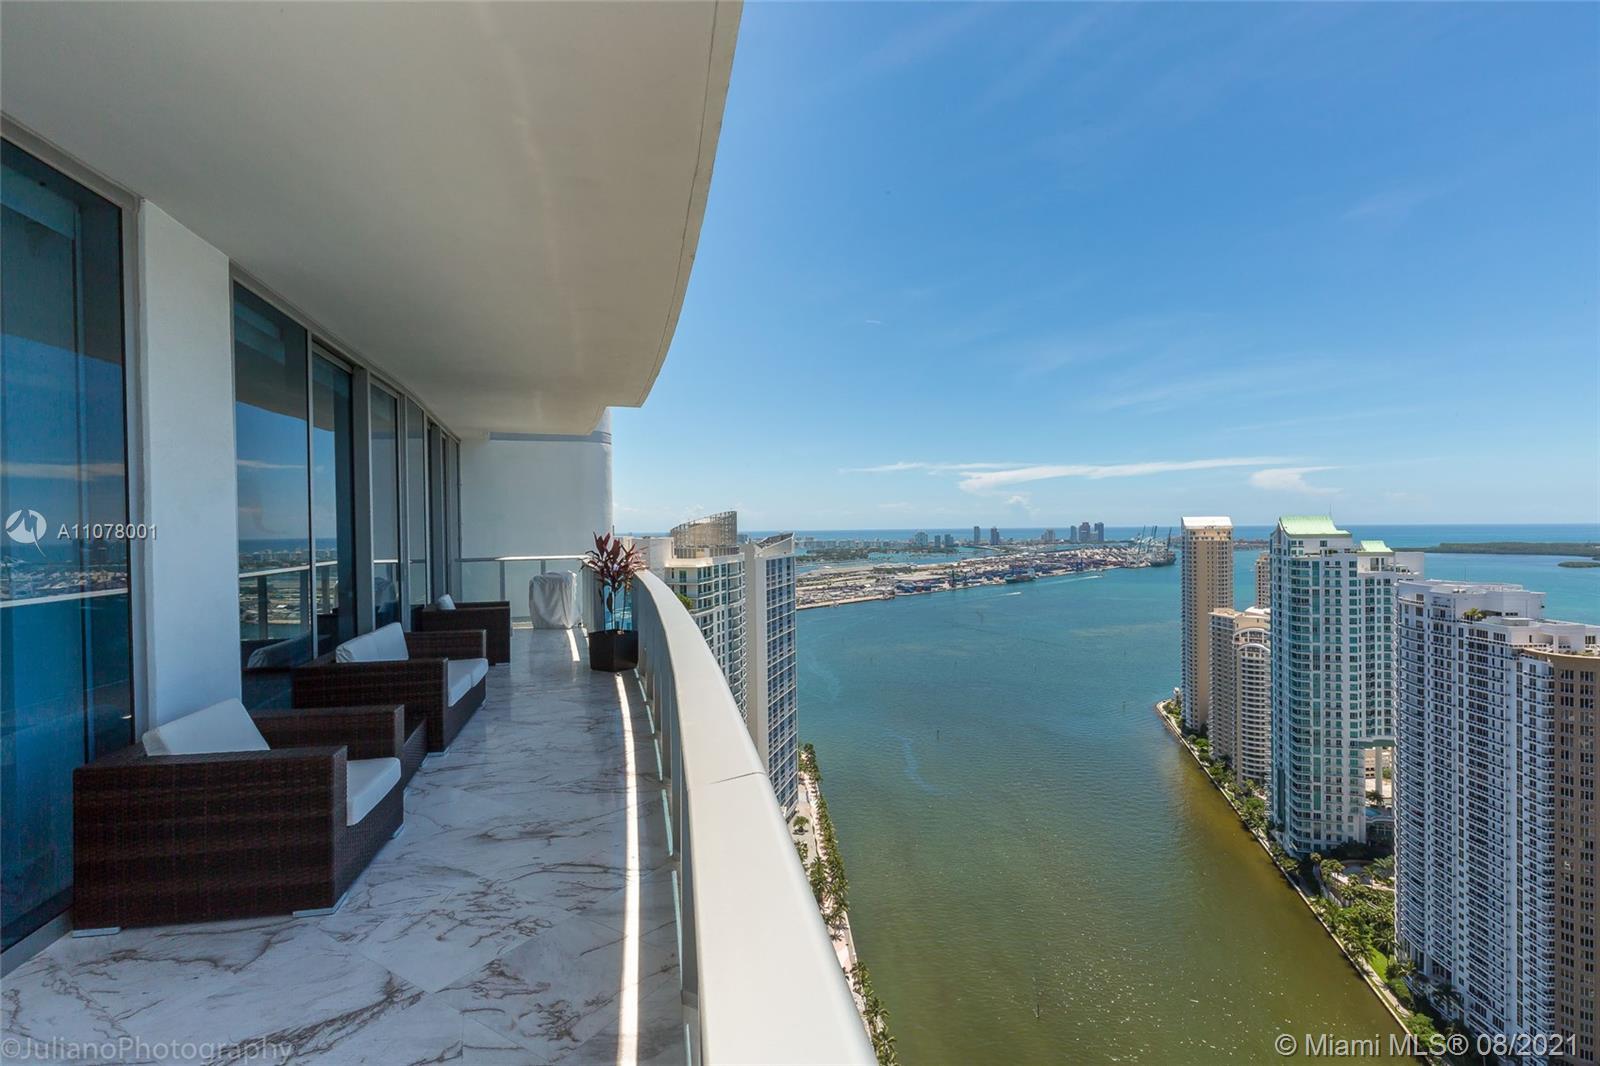 200 Biscayne Boulevard Way Unit 4808, Miami, Florida 33131